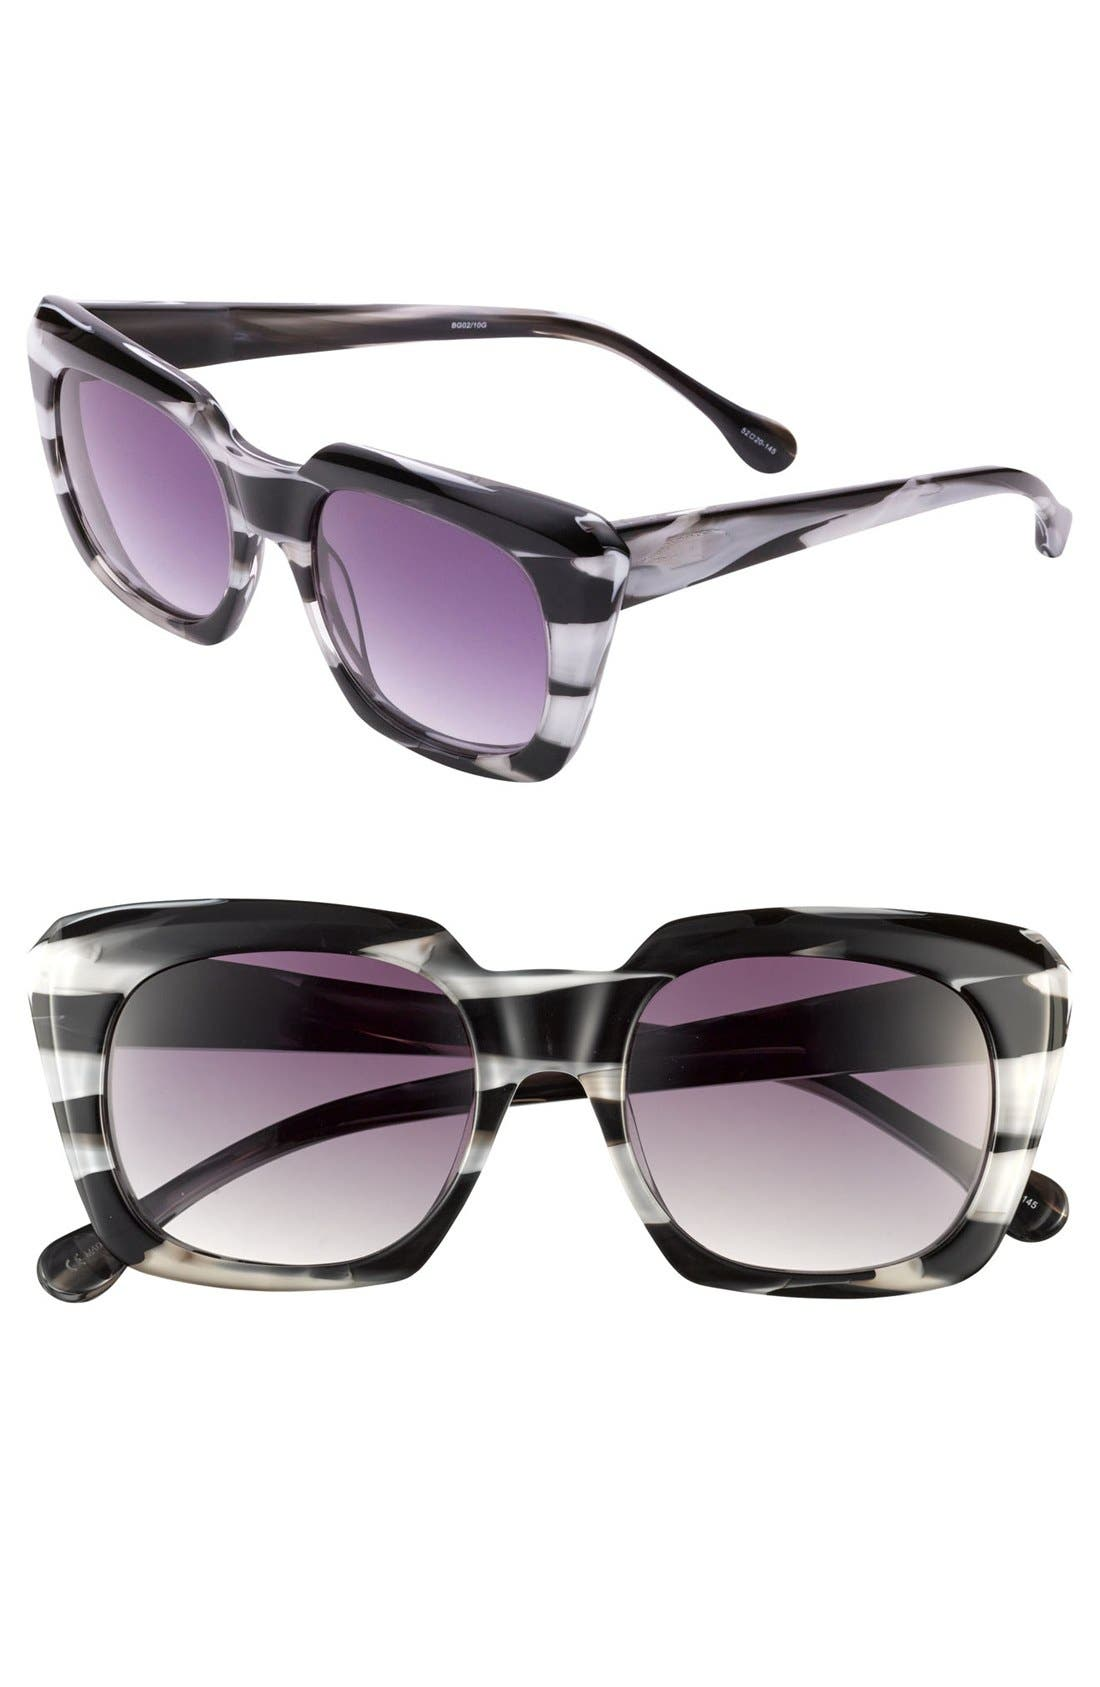 Main Image - Elizabeth and James 'Roosevelt' 52mm Sunglasses (Nordstrom Online Exclusive)